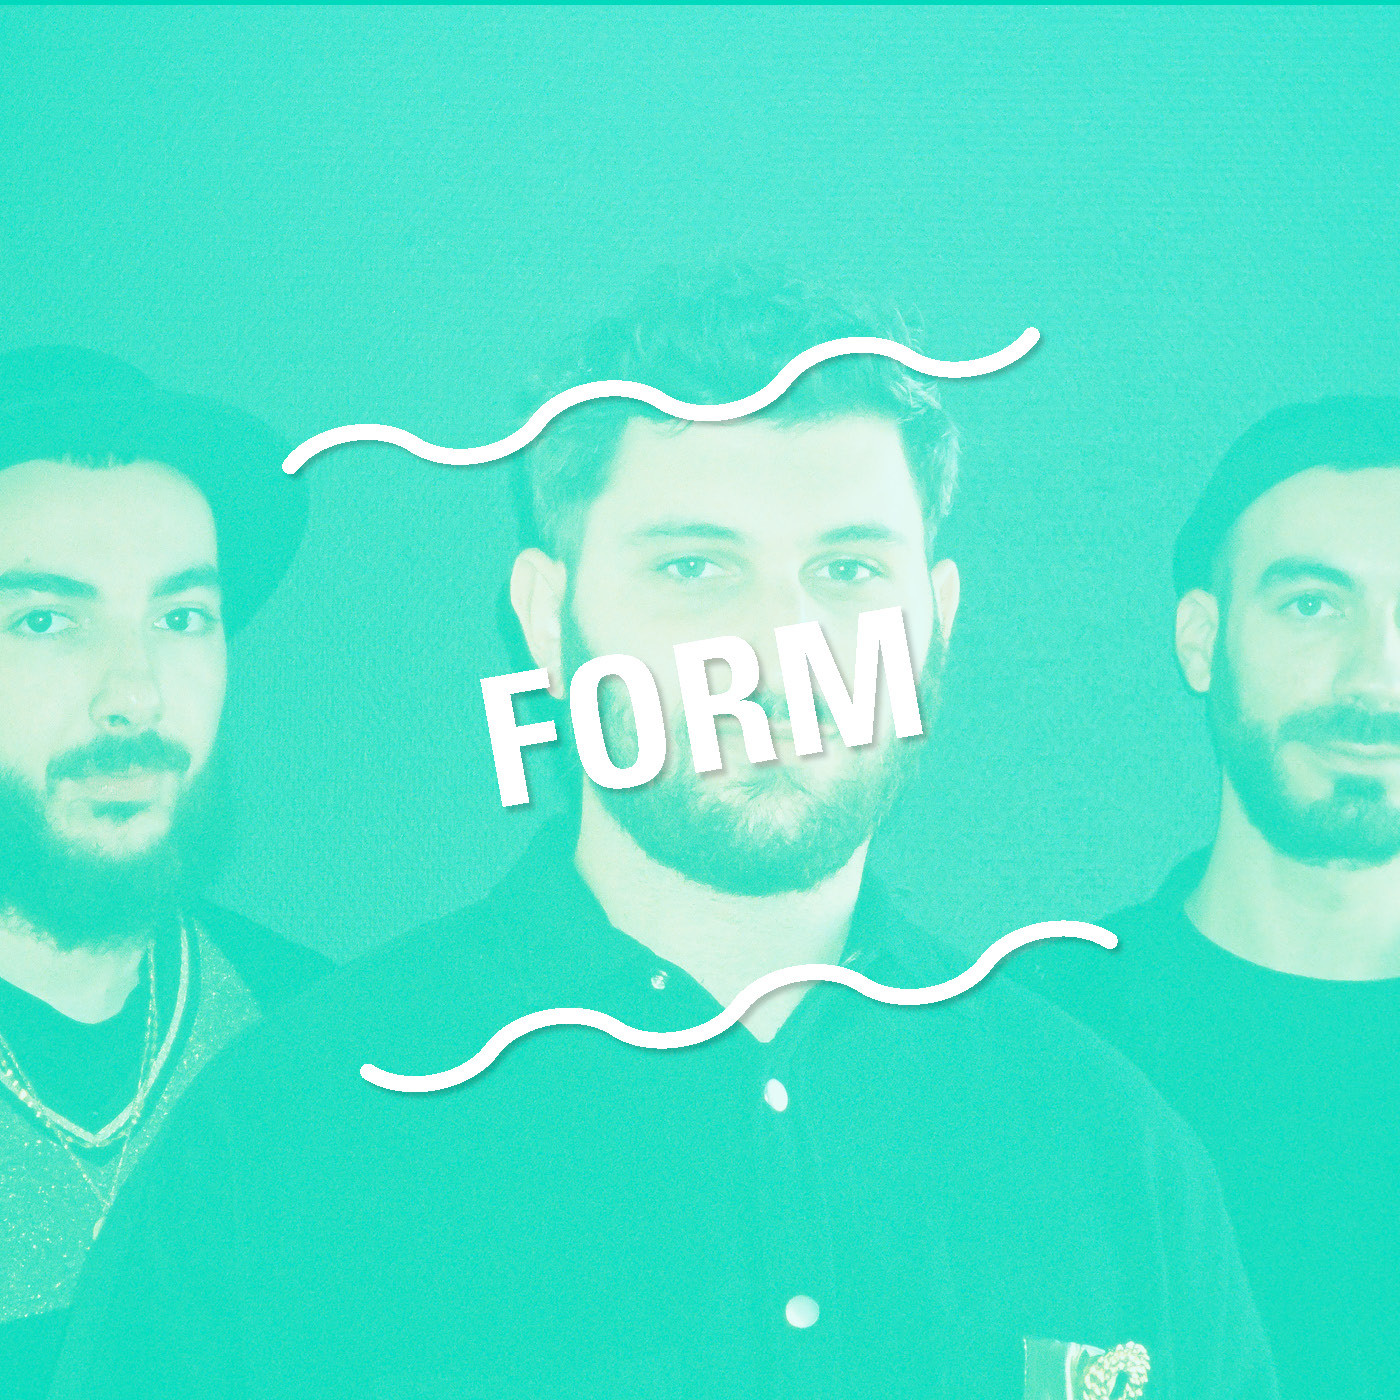 #02 Form